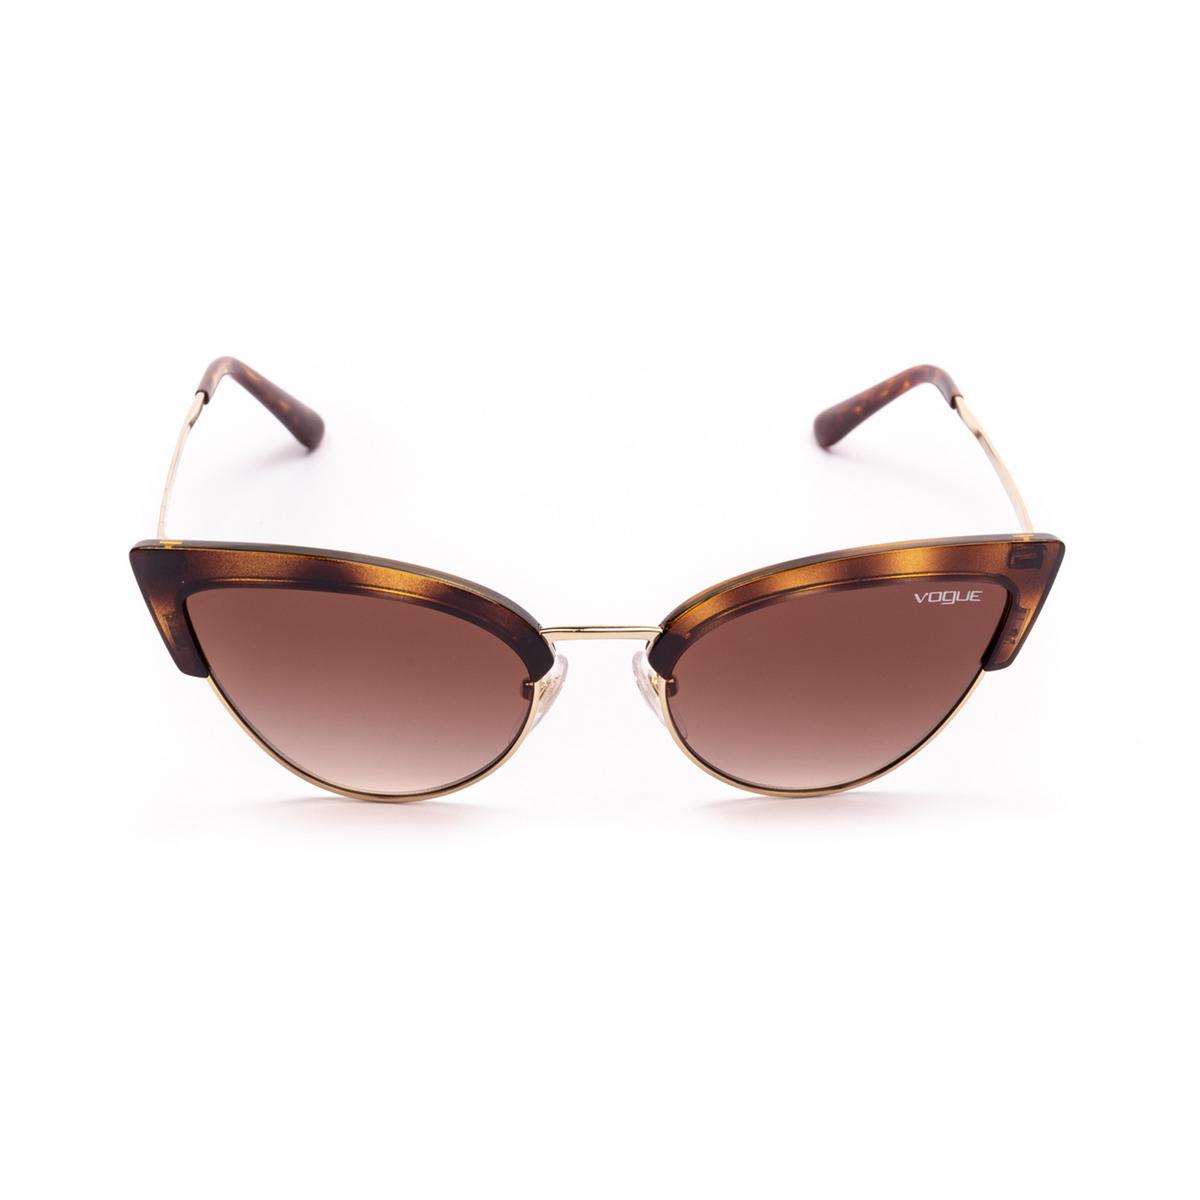 Vogue® Cat-eye Sunglasses: VO5212S color Top Dark Havana / Pale Gold W65613 - front view.